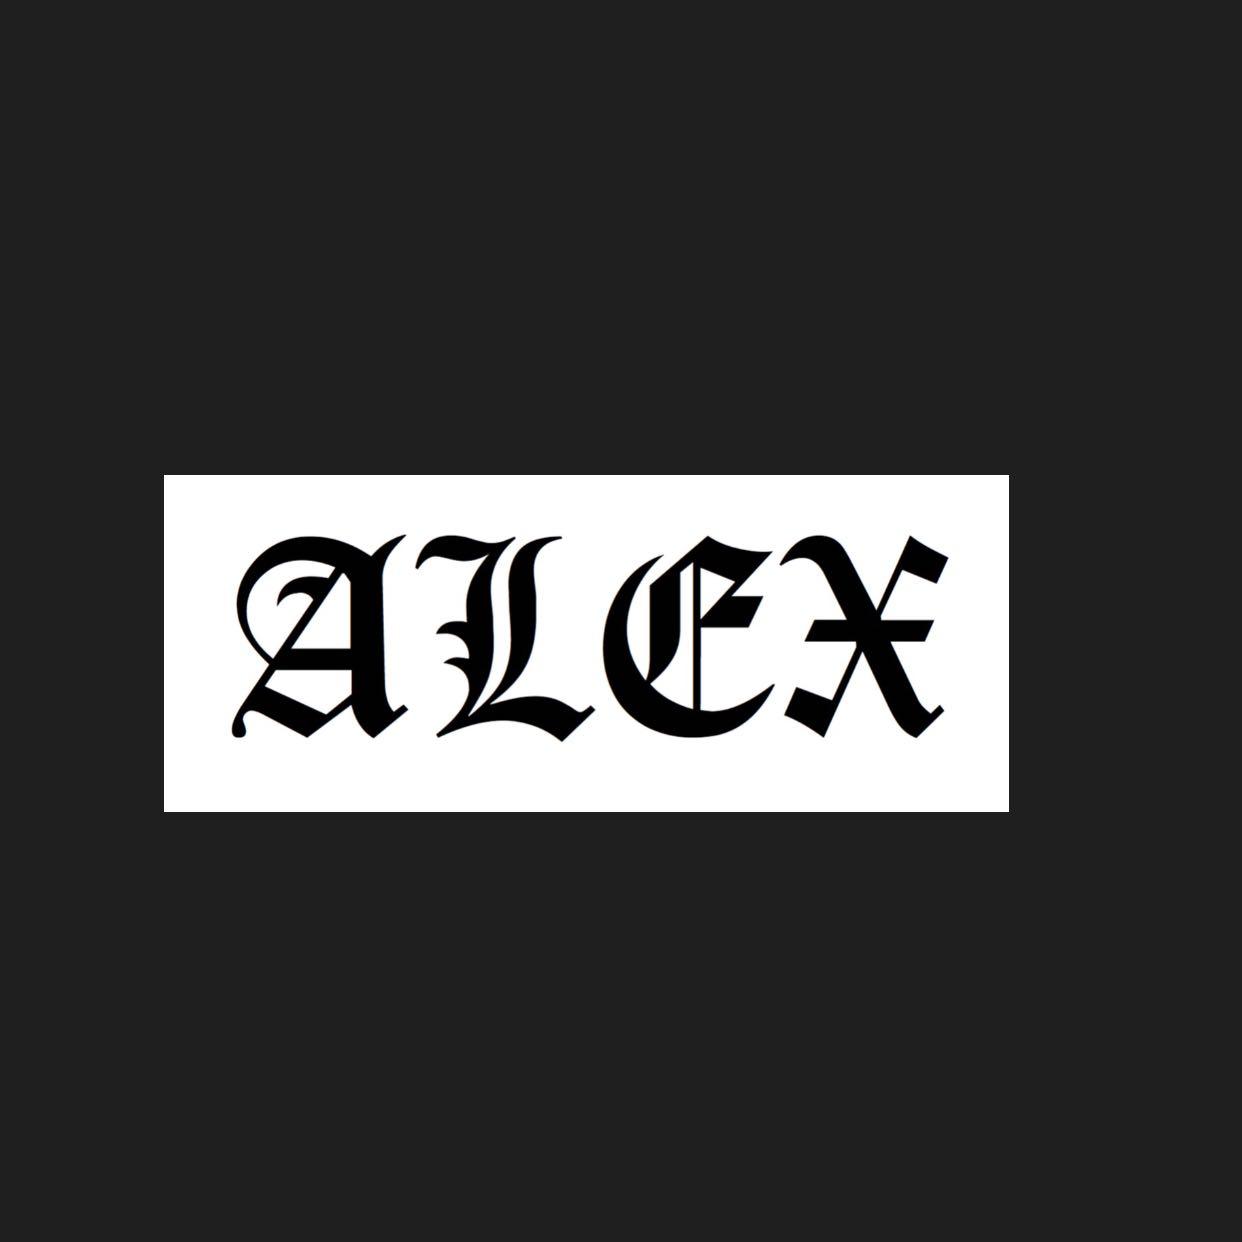 alexong75